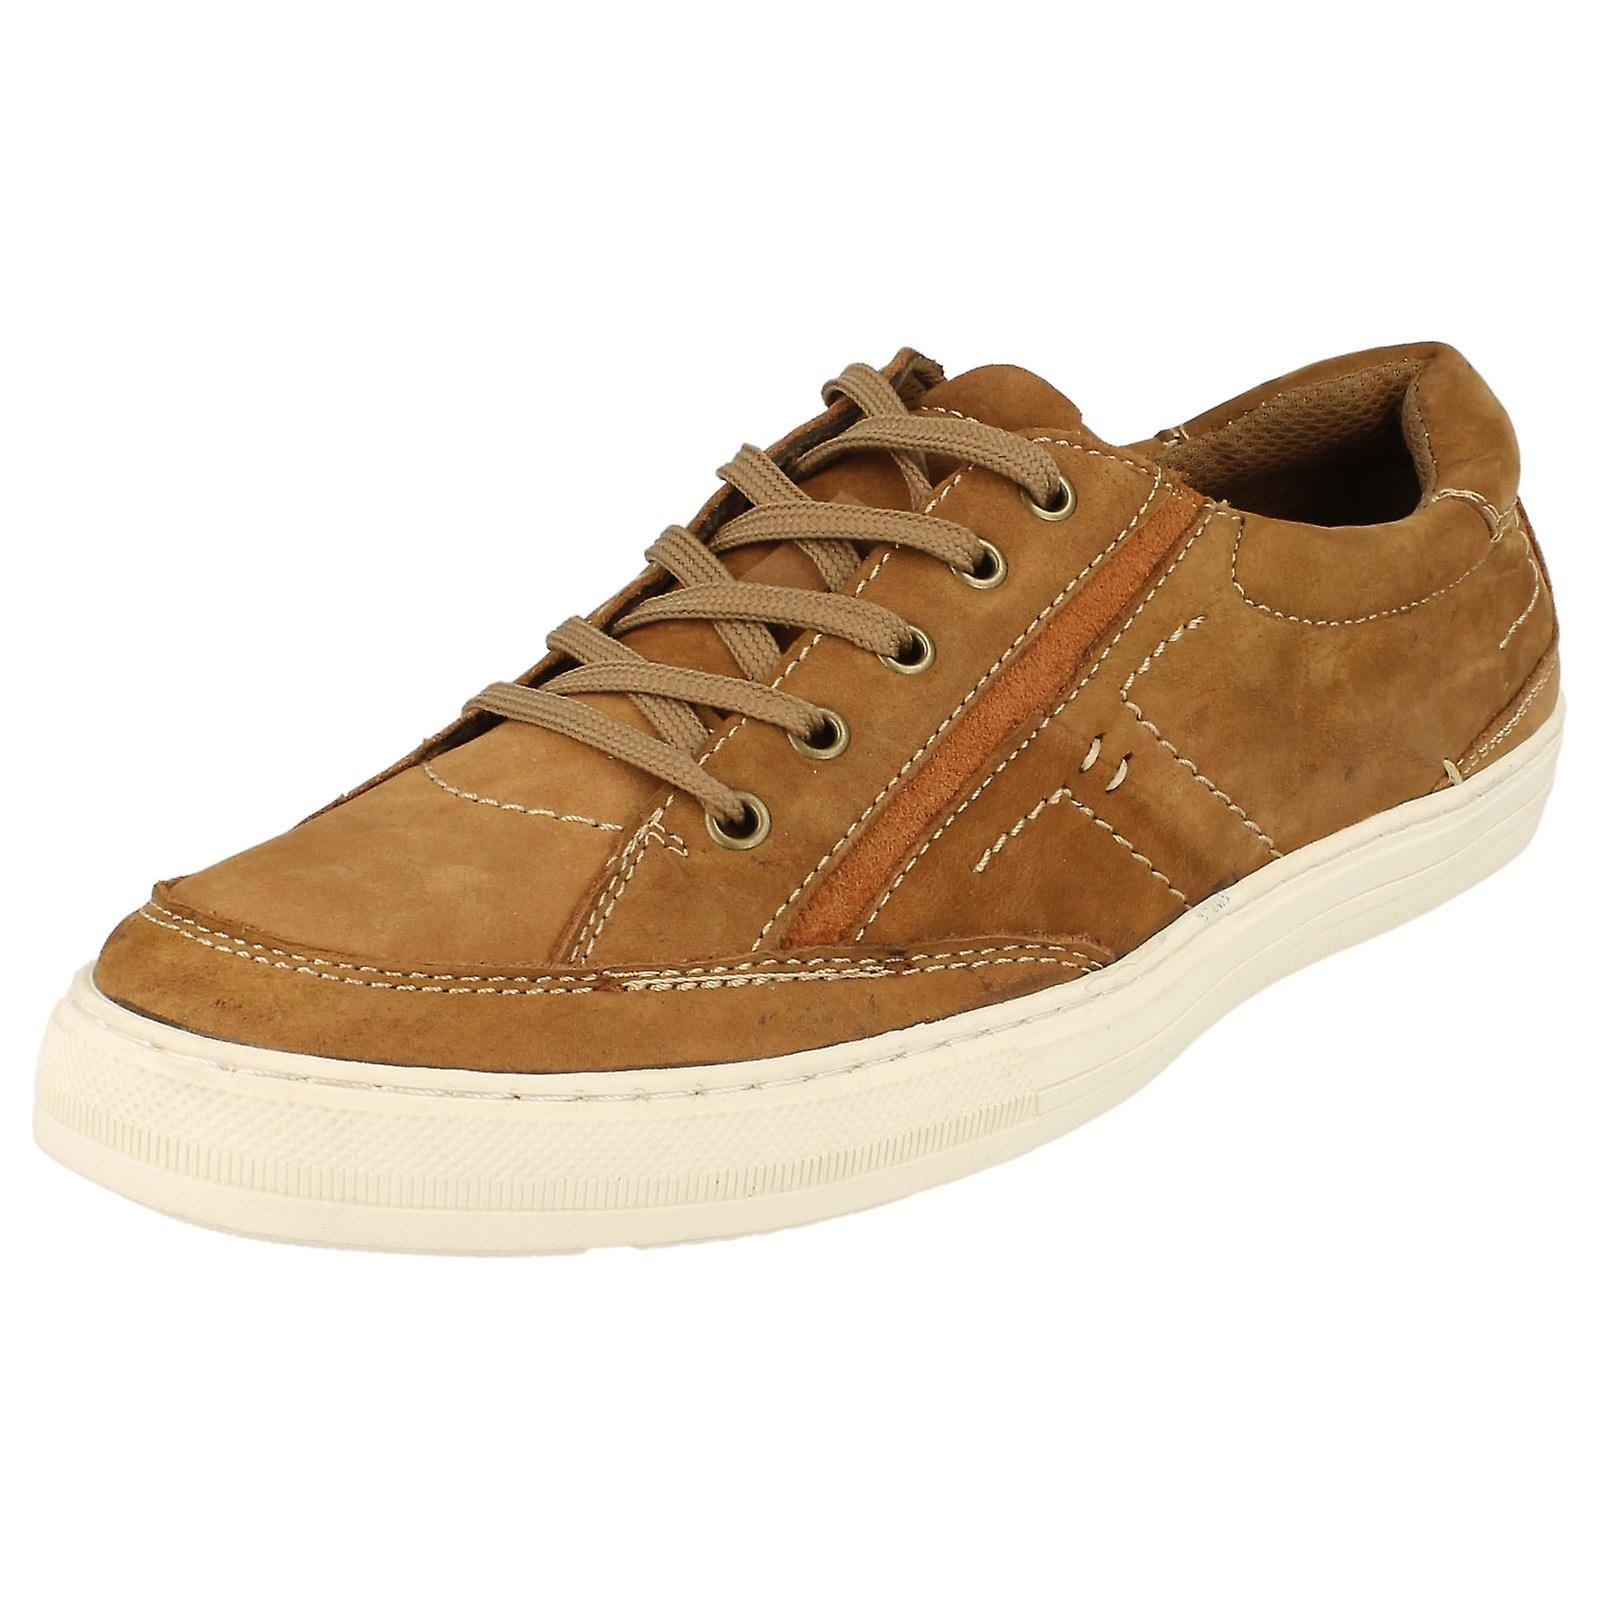 Trainer Mens Casual Maverick Style Shoe rraEBw